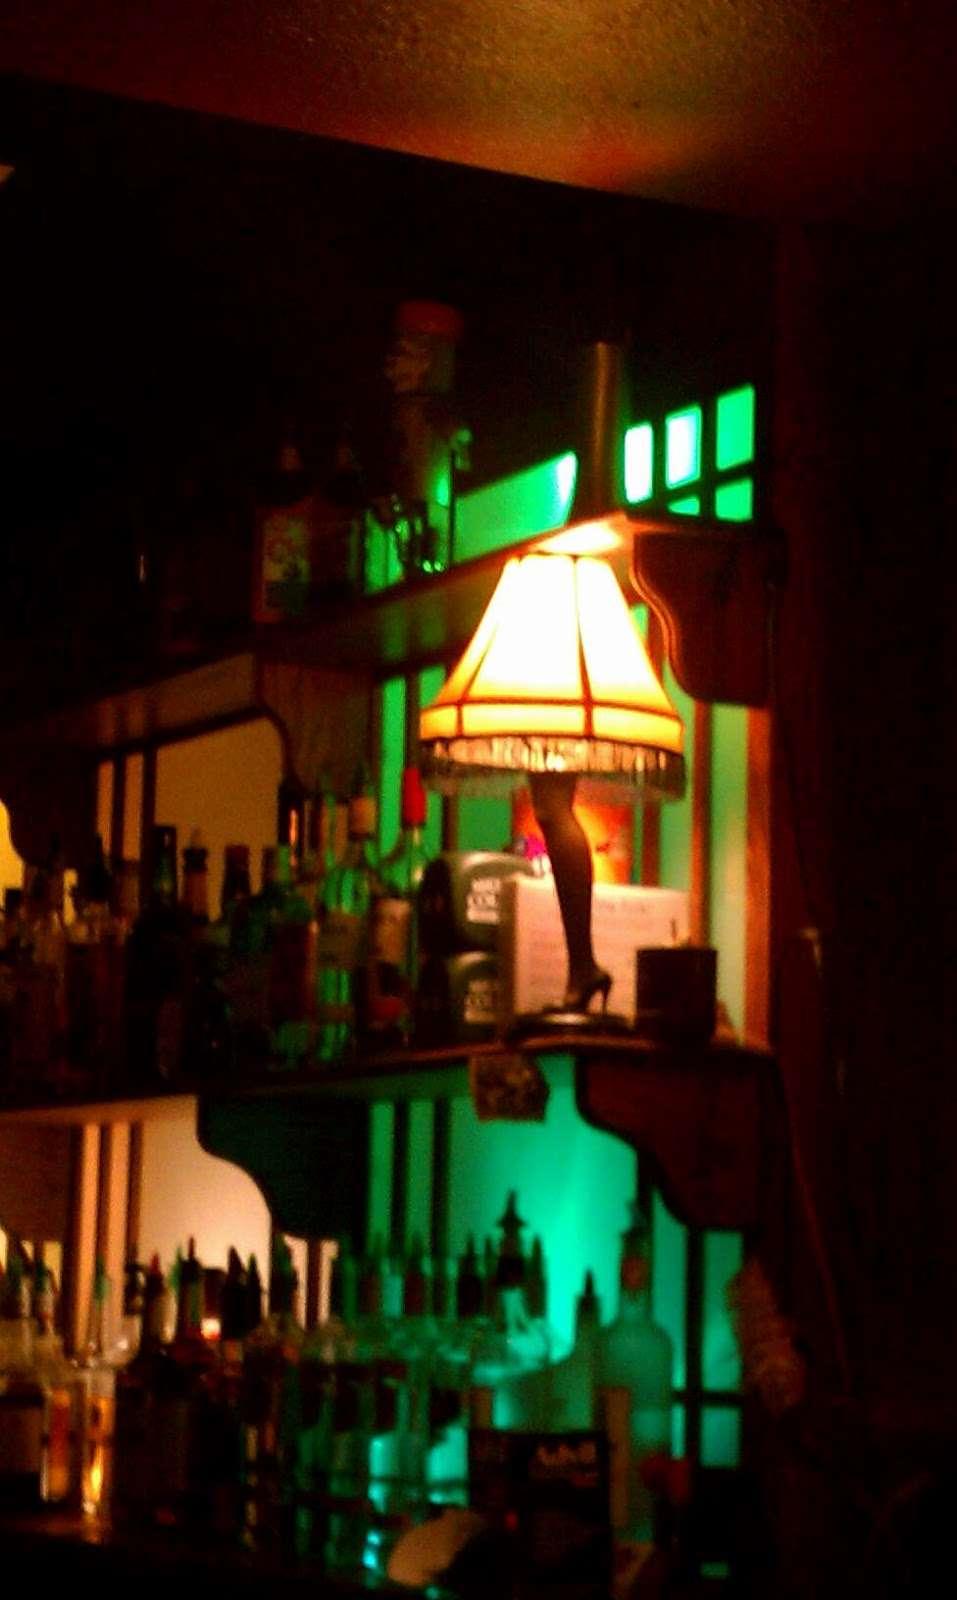 Mardi Gras Pizza & Pub - restaurant  | Photo 9 of 10 | Address: 732 Main St, Lapel, IN 46051, USA | Phone: (765) 534-3388